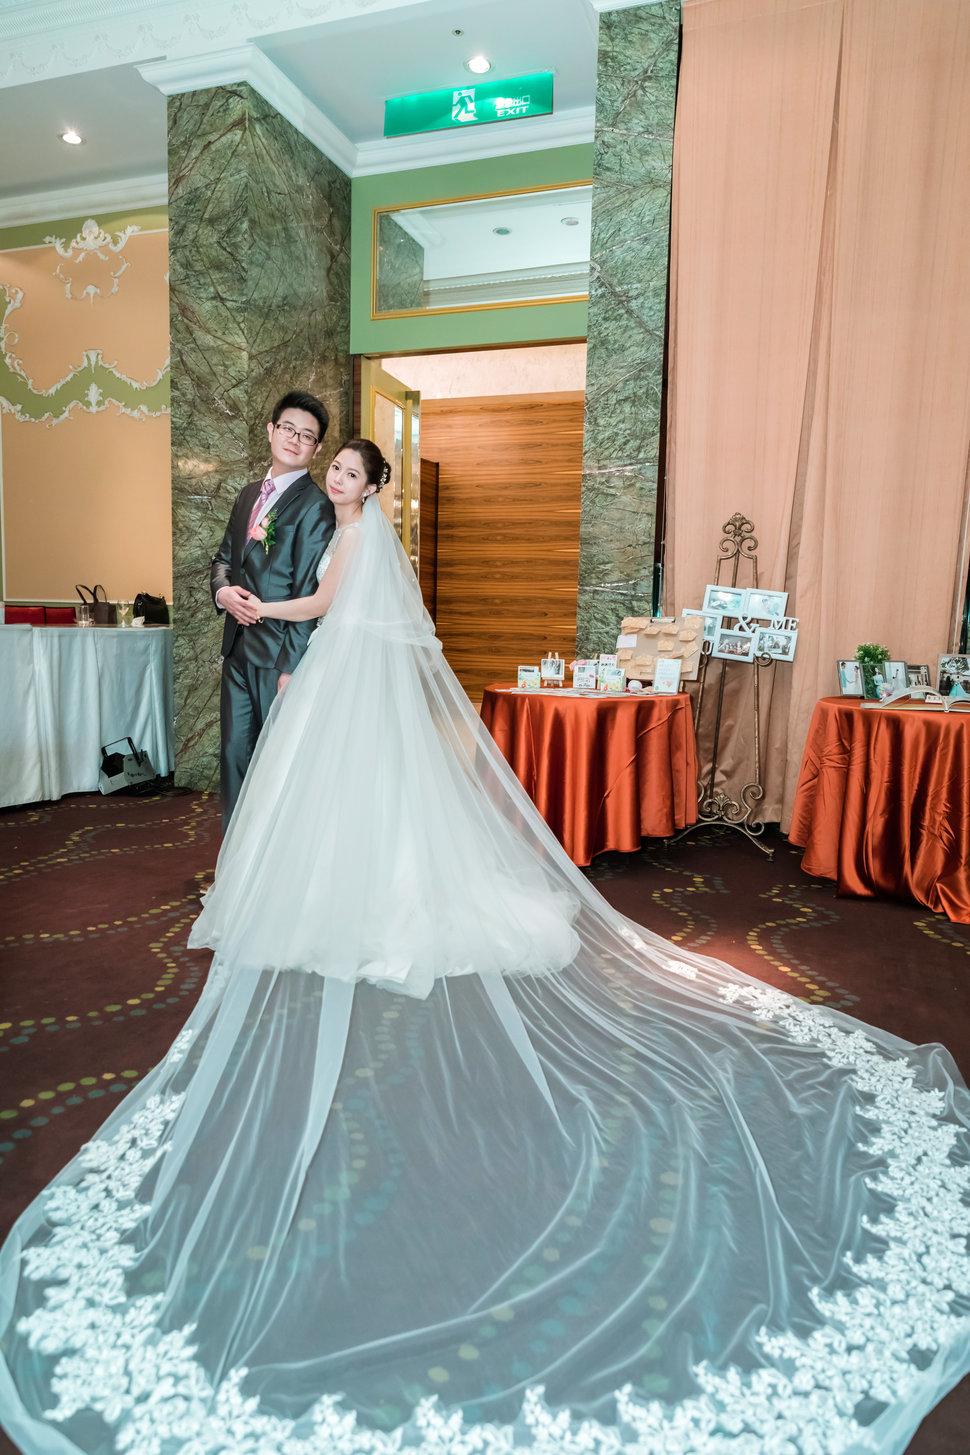 5D4_5346 - Promaker婚禮紀錄攝影團隊婚攝豪哥《結婚吧》